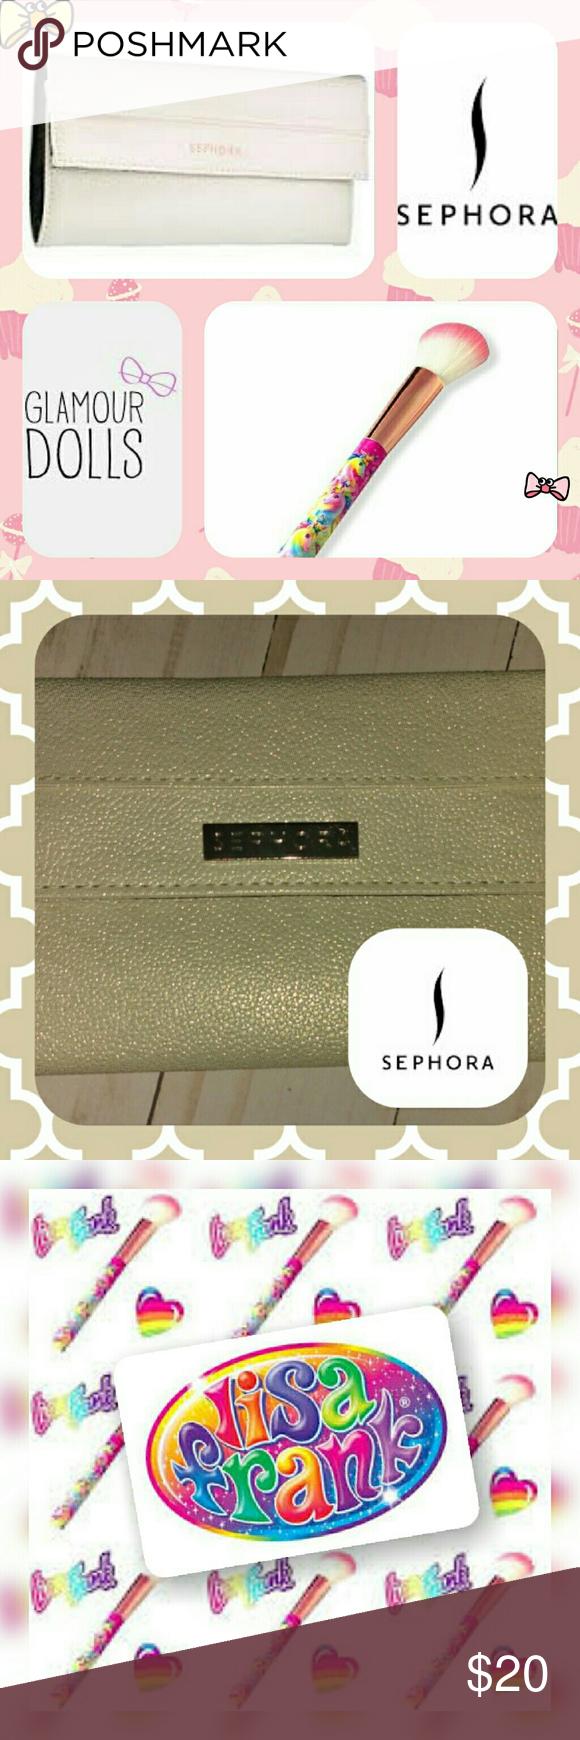 {Sephora + Glamour Dolls} Set _Sephora Gold Sparkle Make